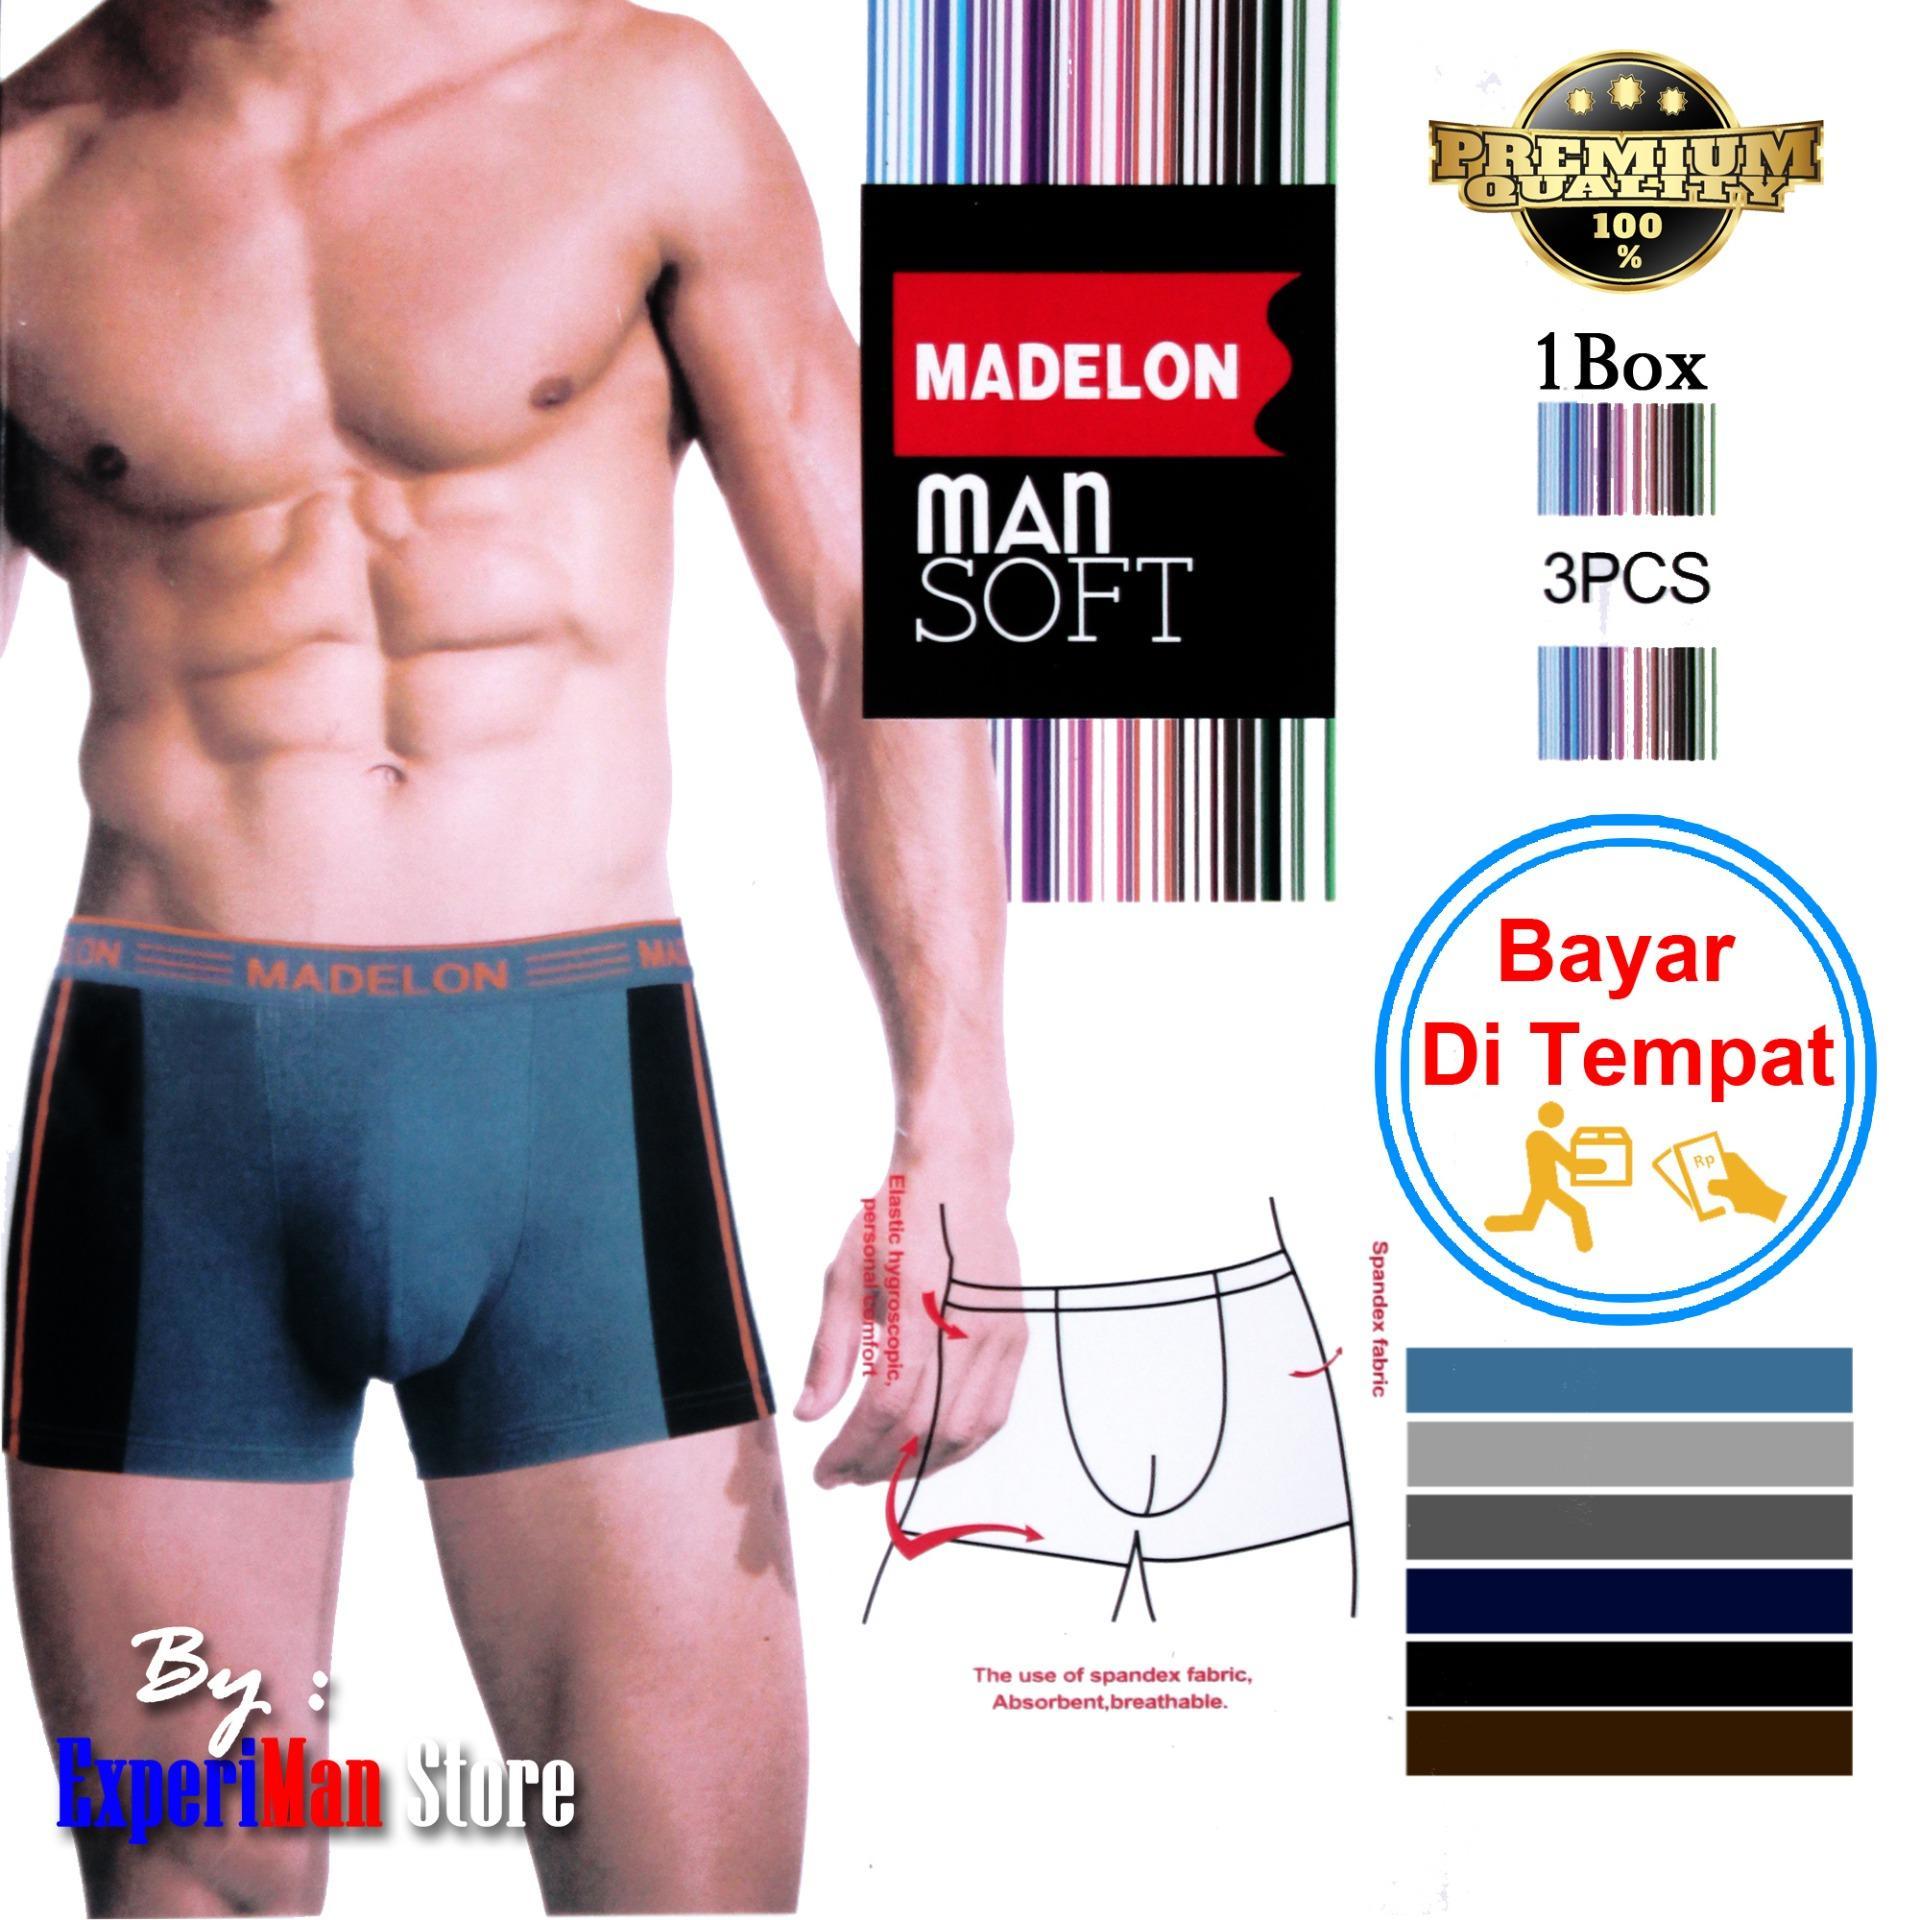 Daftar Produk Dalam Kategori Pakaian Boxer Pria Hargaupdate Levis 200sf Boxerbrief Charcoal 21168 0001 Size S 12 Pcs Madelon Celana Impor Harga Grosir